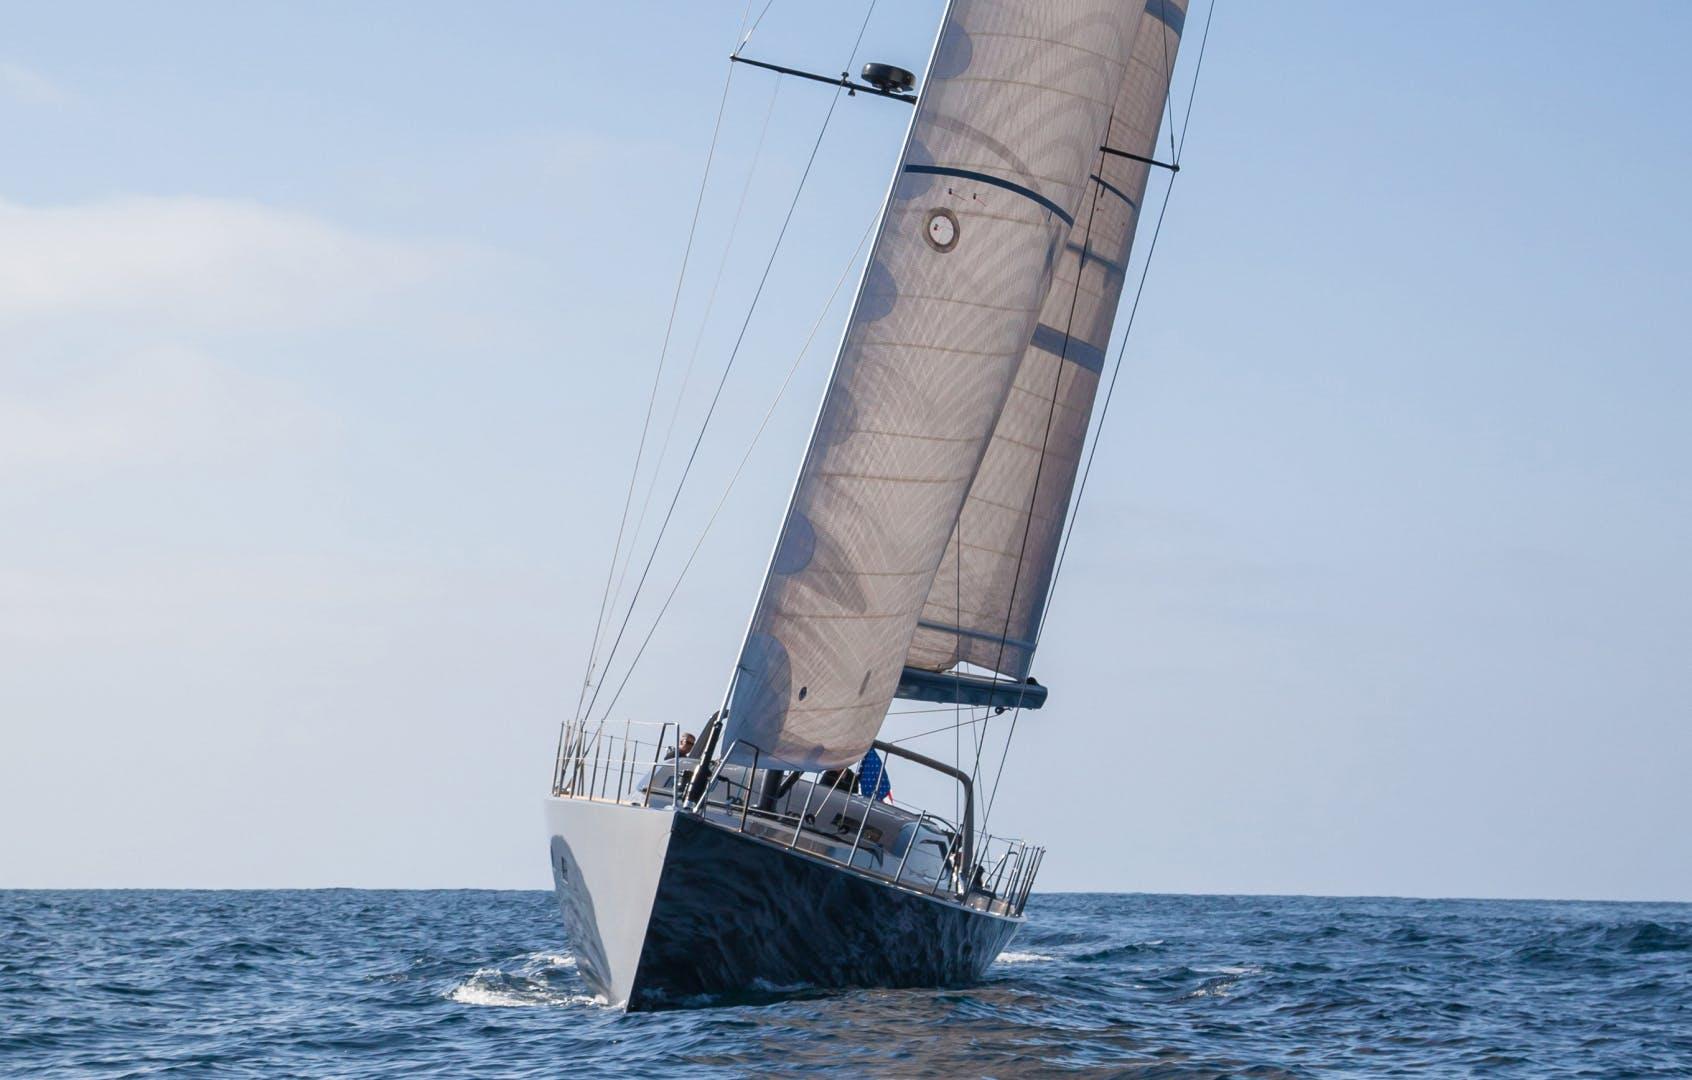 1996 Goetz / Derecktor 77' Custom Sparkman & Stephens Designed Performance Sailing Yacht AANDEEL | Picture 5 of 24